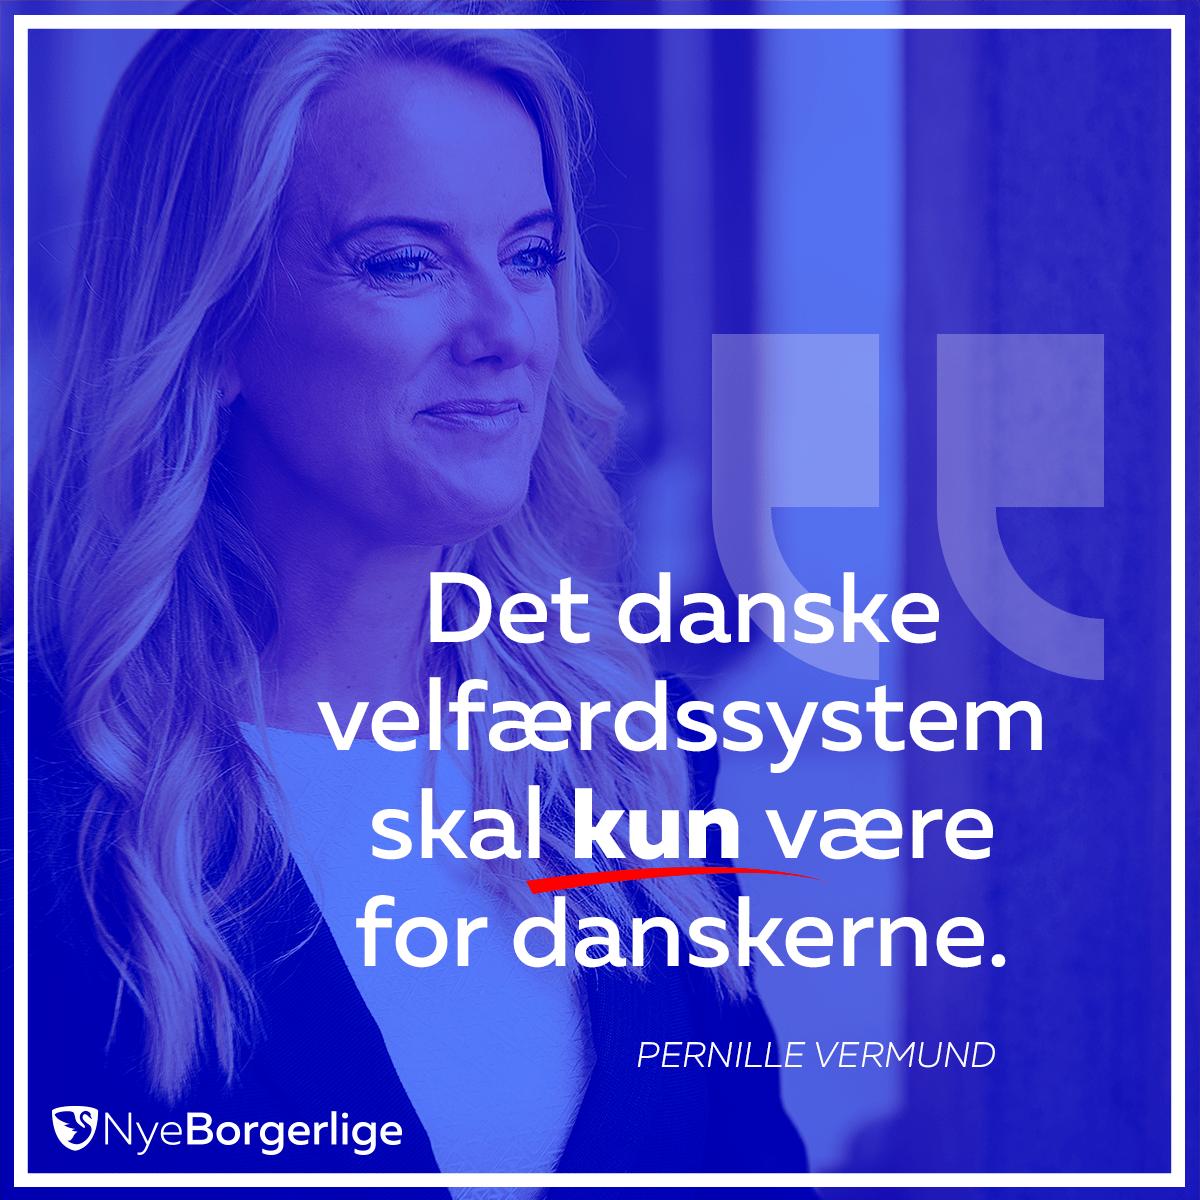 Pernille Vermund Nye Borgerlige